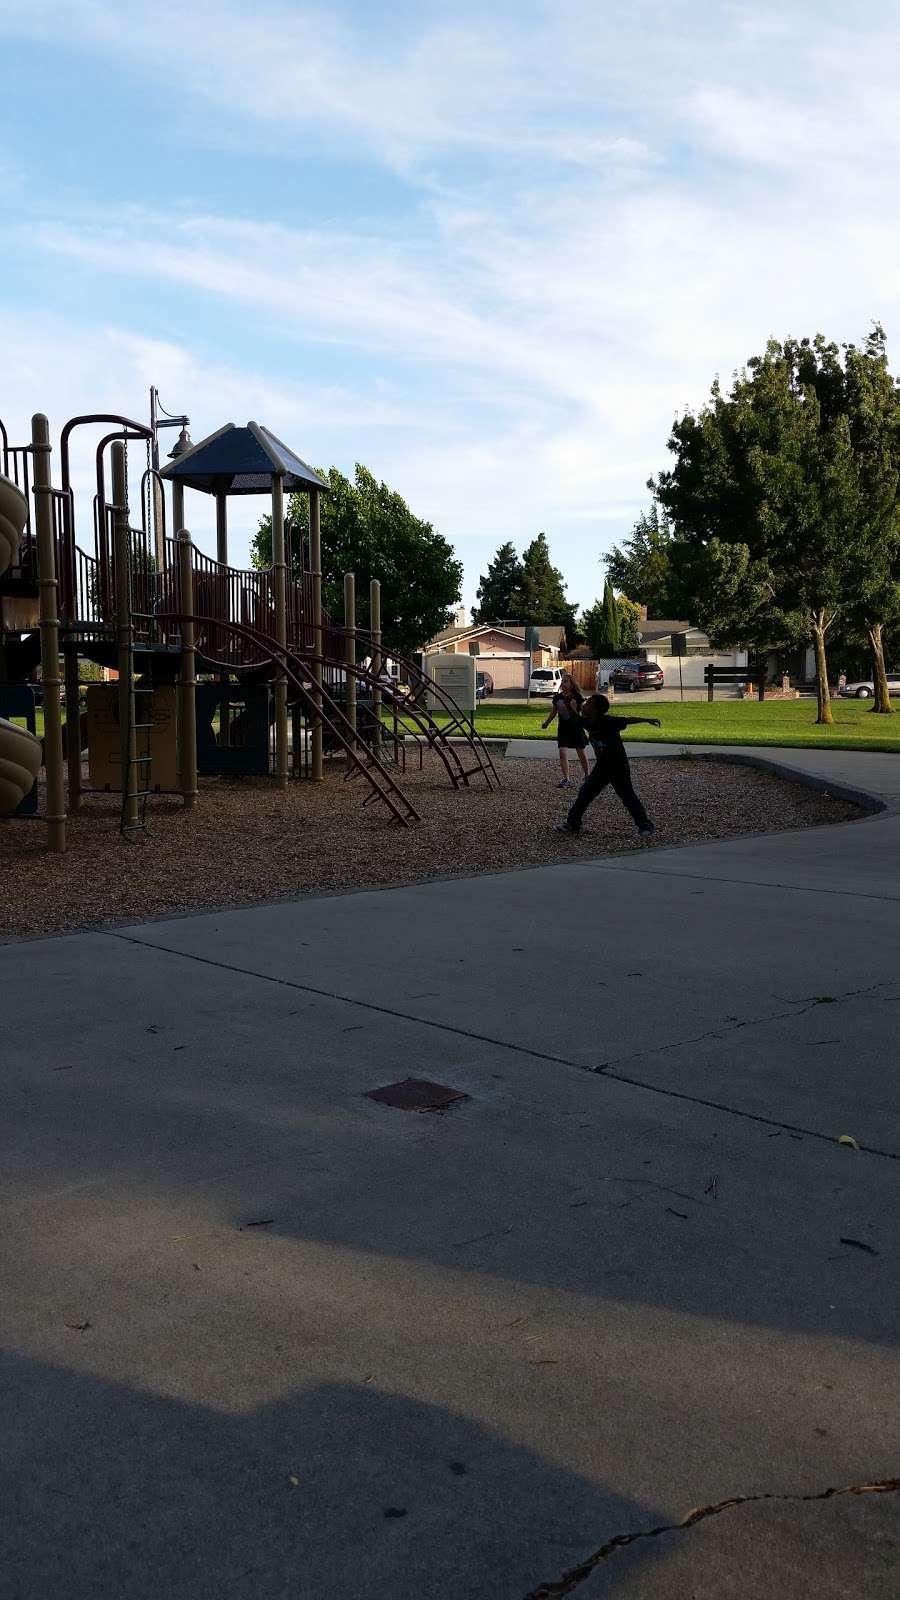 Ridgeview Park - park  | Photo 2 of 10 | Address: 4966 Silver Creek Rd, Fairfield, CA 94534, USA | Phone: (707) 428-7431